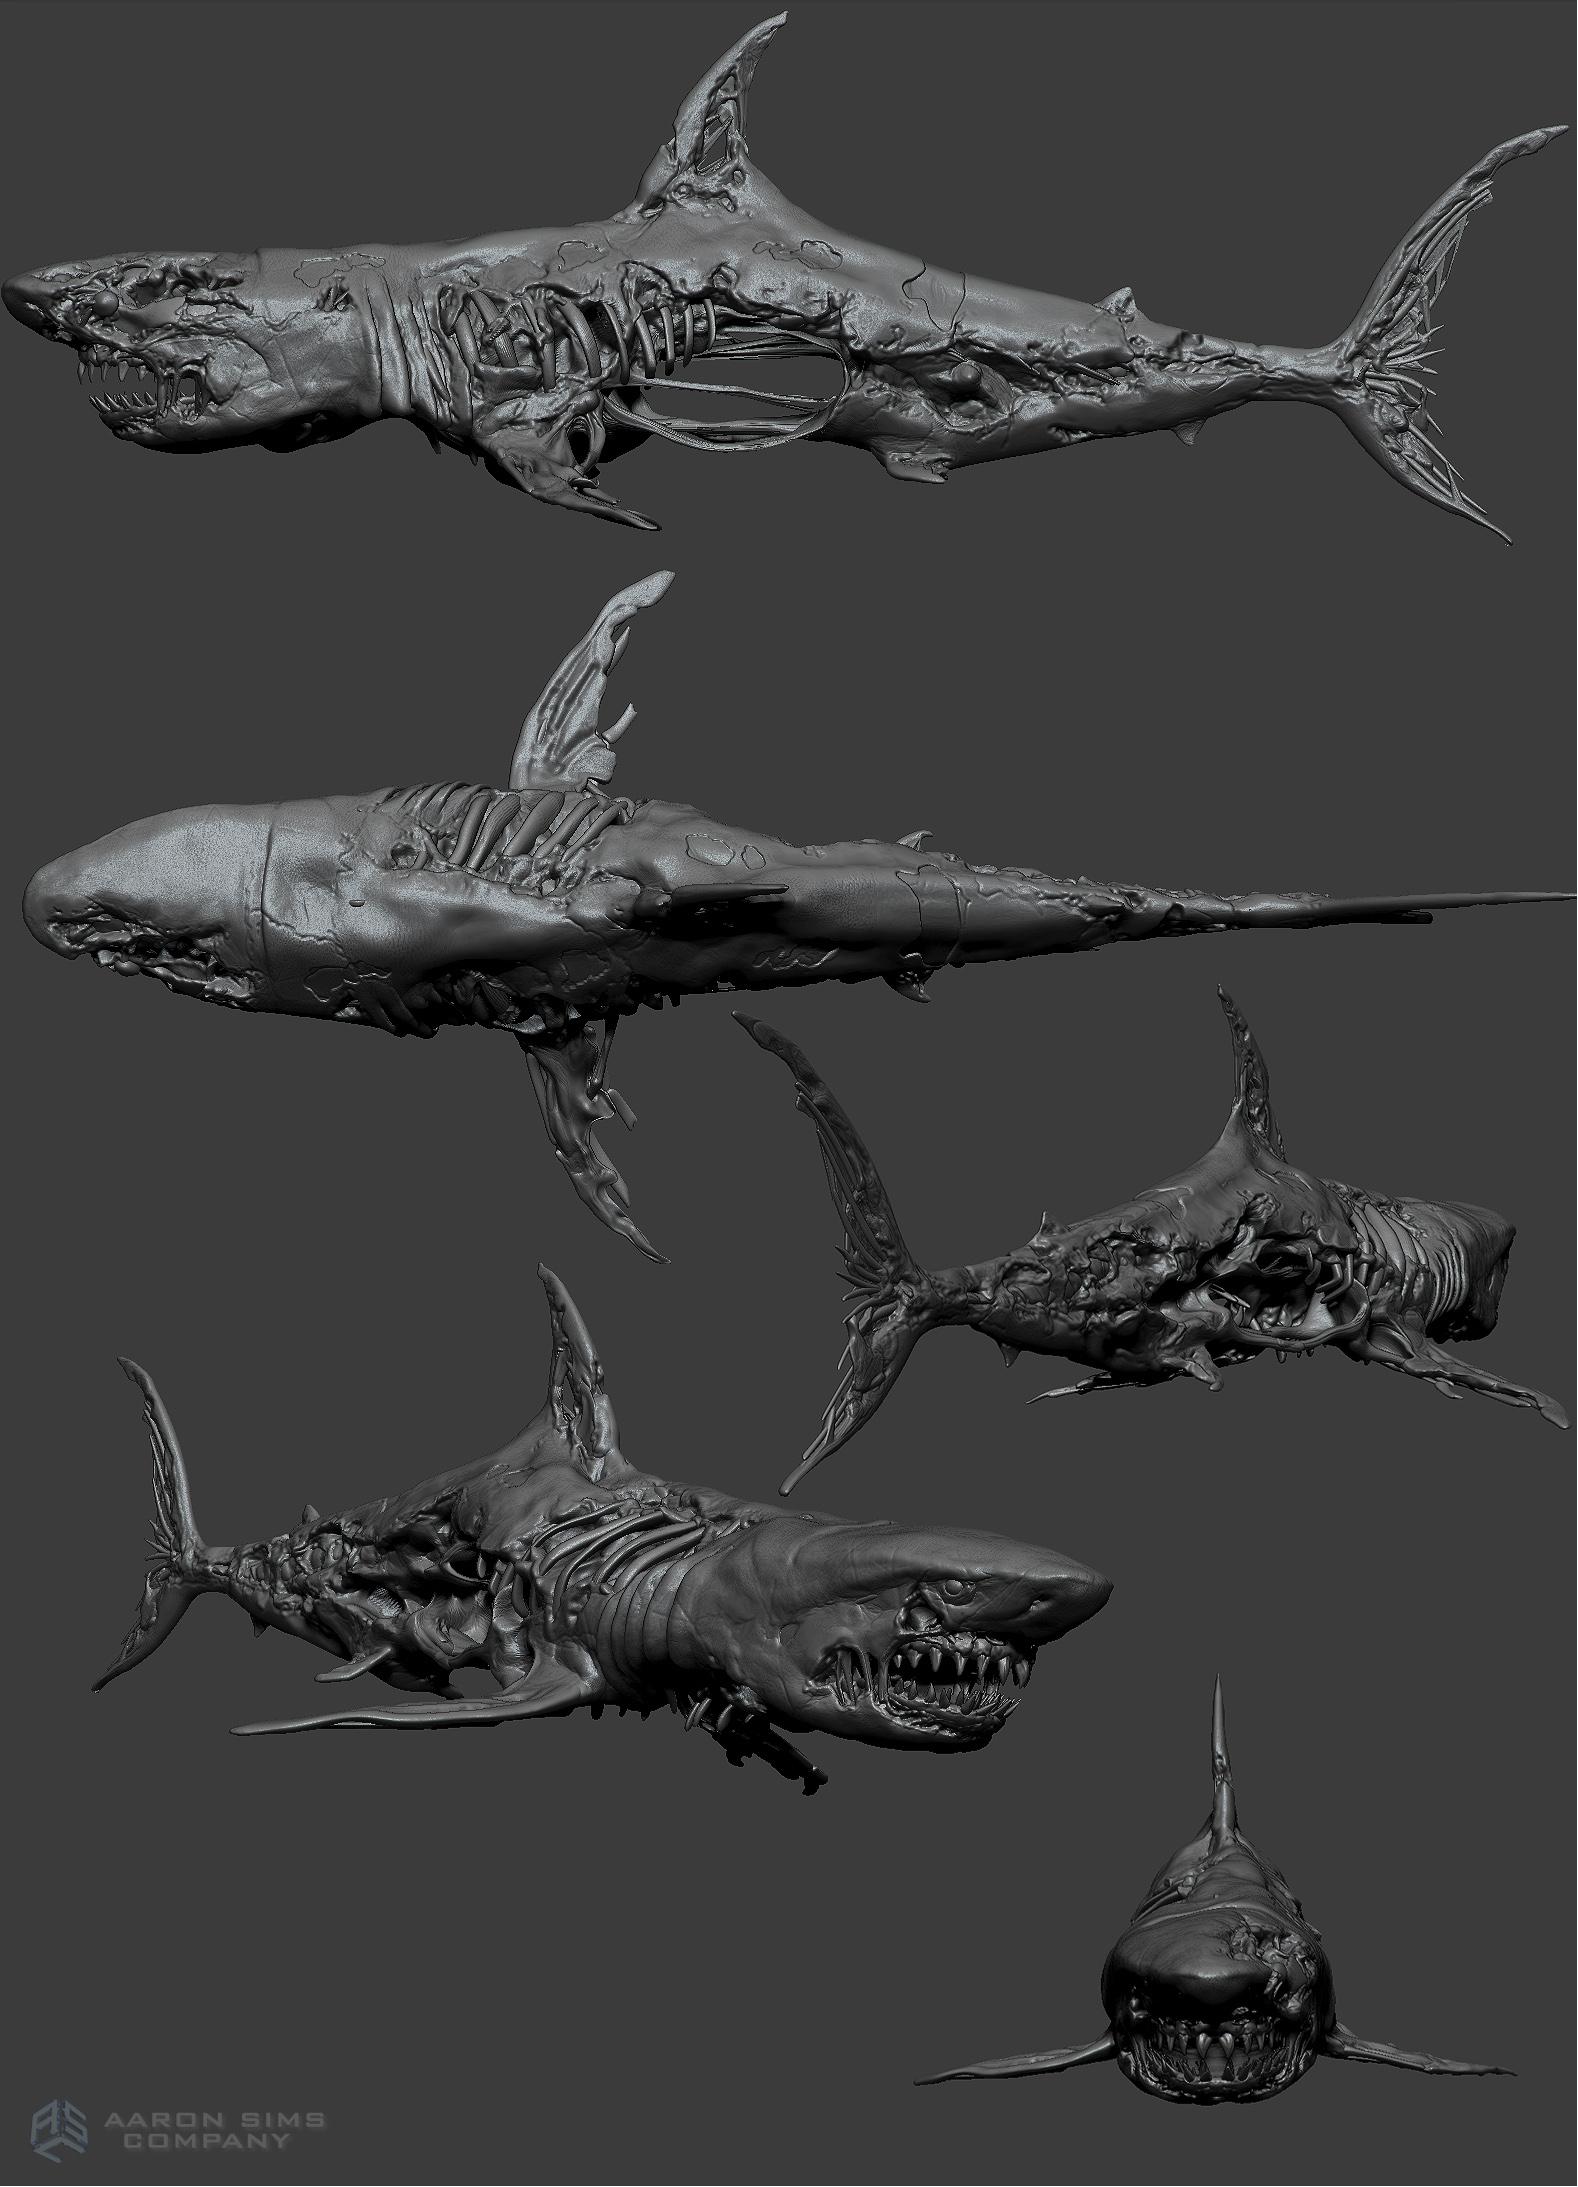 ASC_Pirates5_Sharks_v10_11-14-14.jpg